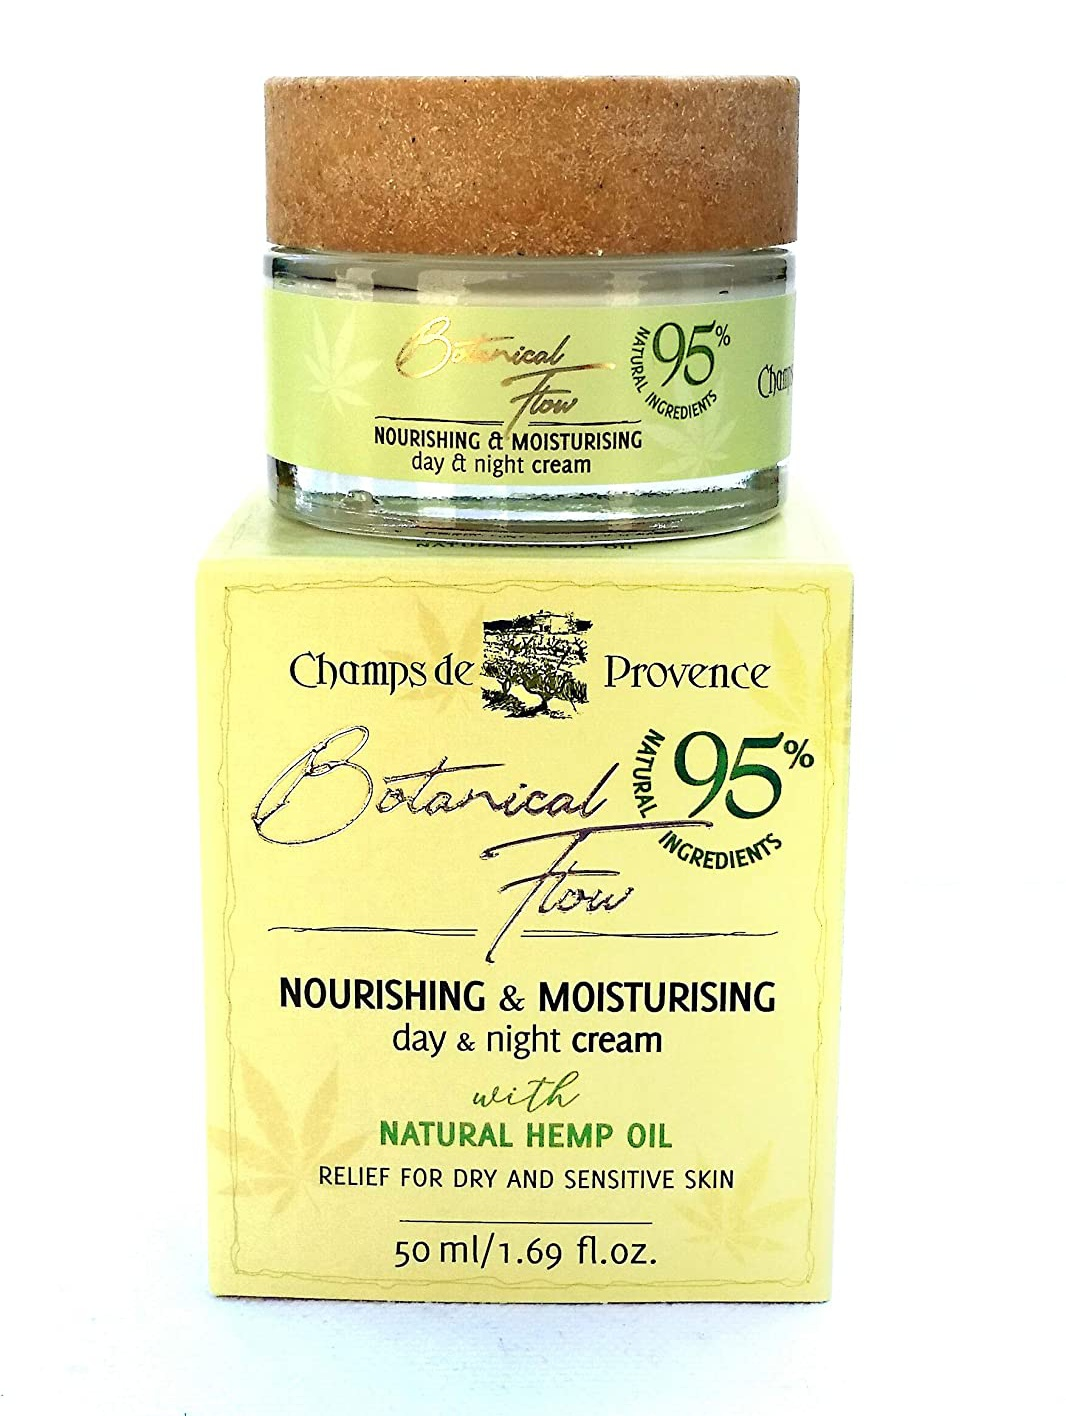 Champs de Provence Nourishing And Moisturizing Cream - Natural Hemp Oil